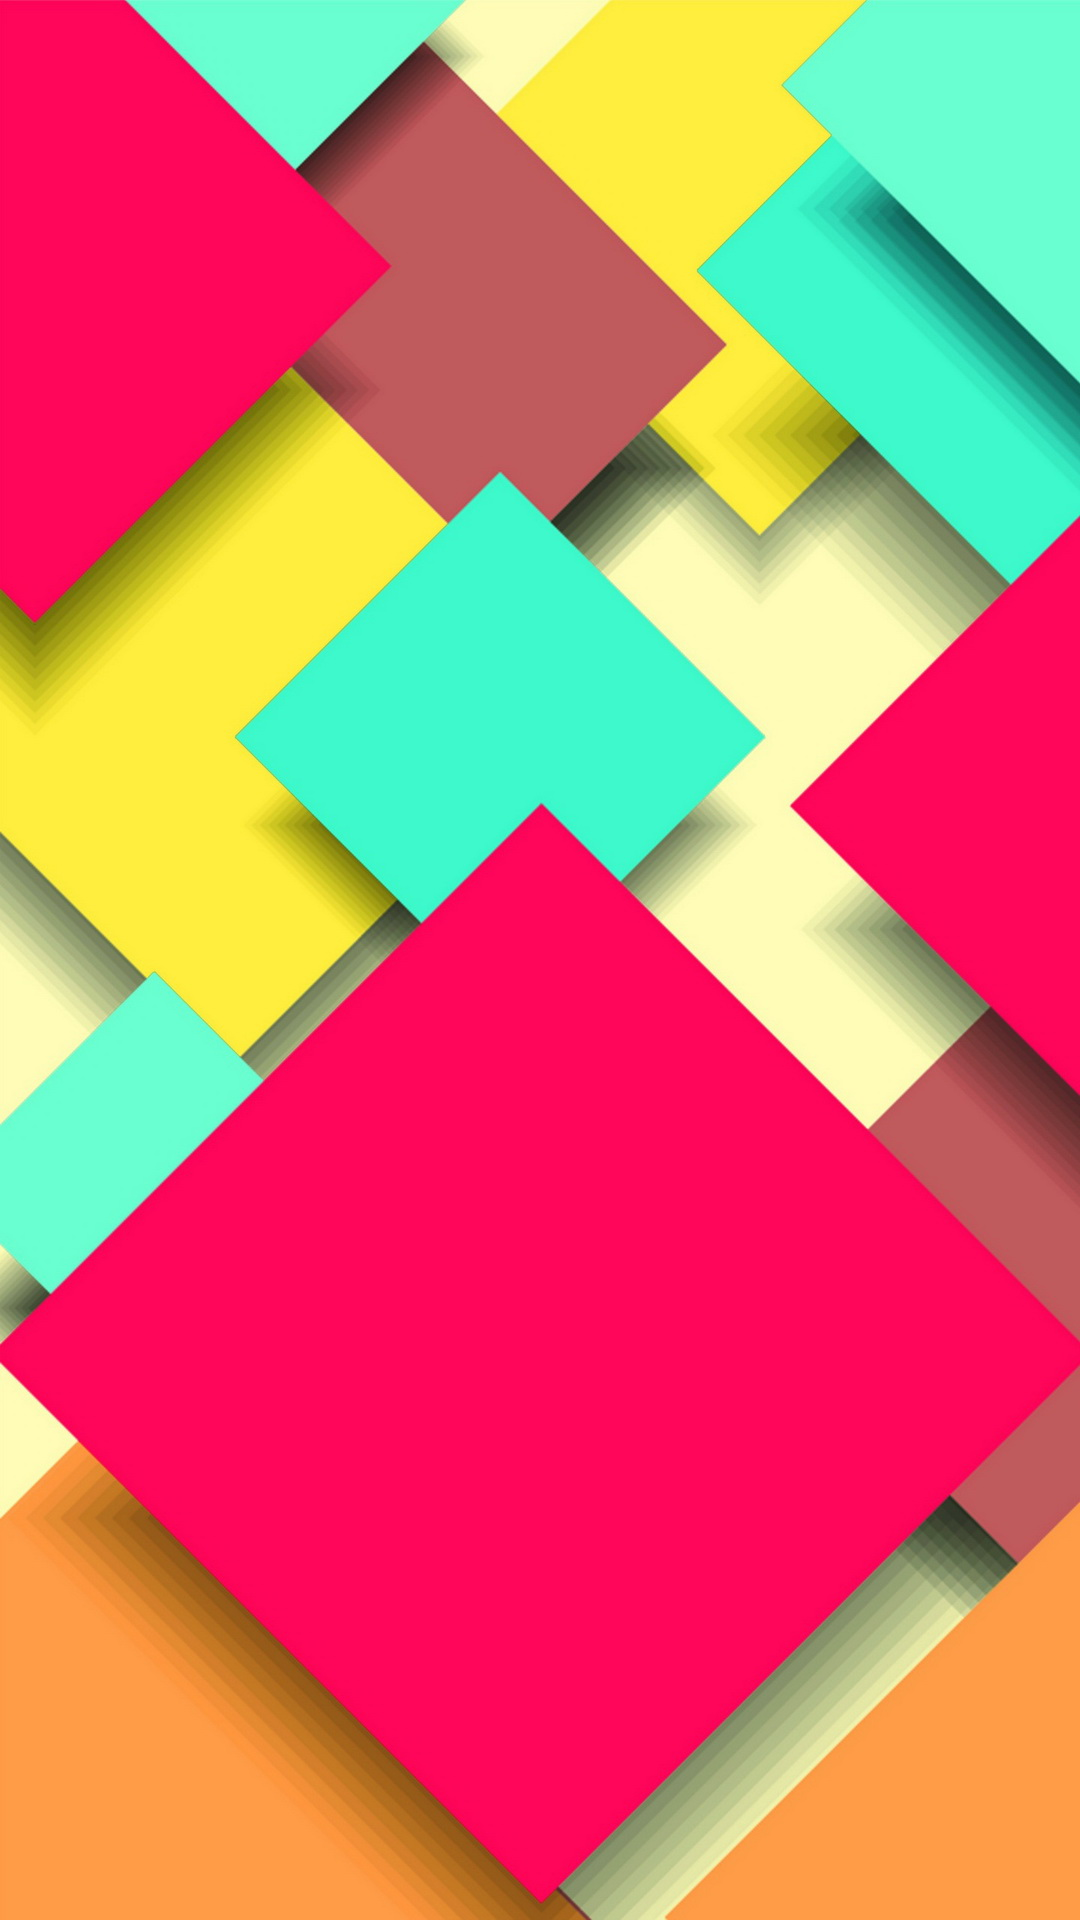 Hd wallpaper for iphone 6 - Squares Iphone 6 Plus Fullhd Wallpaper